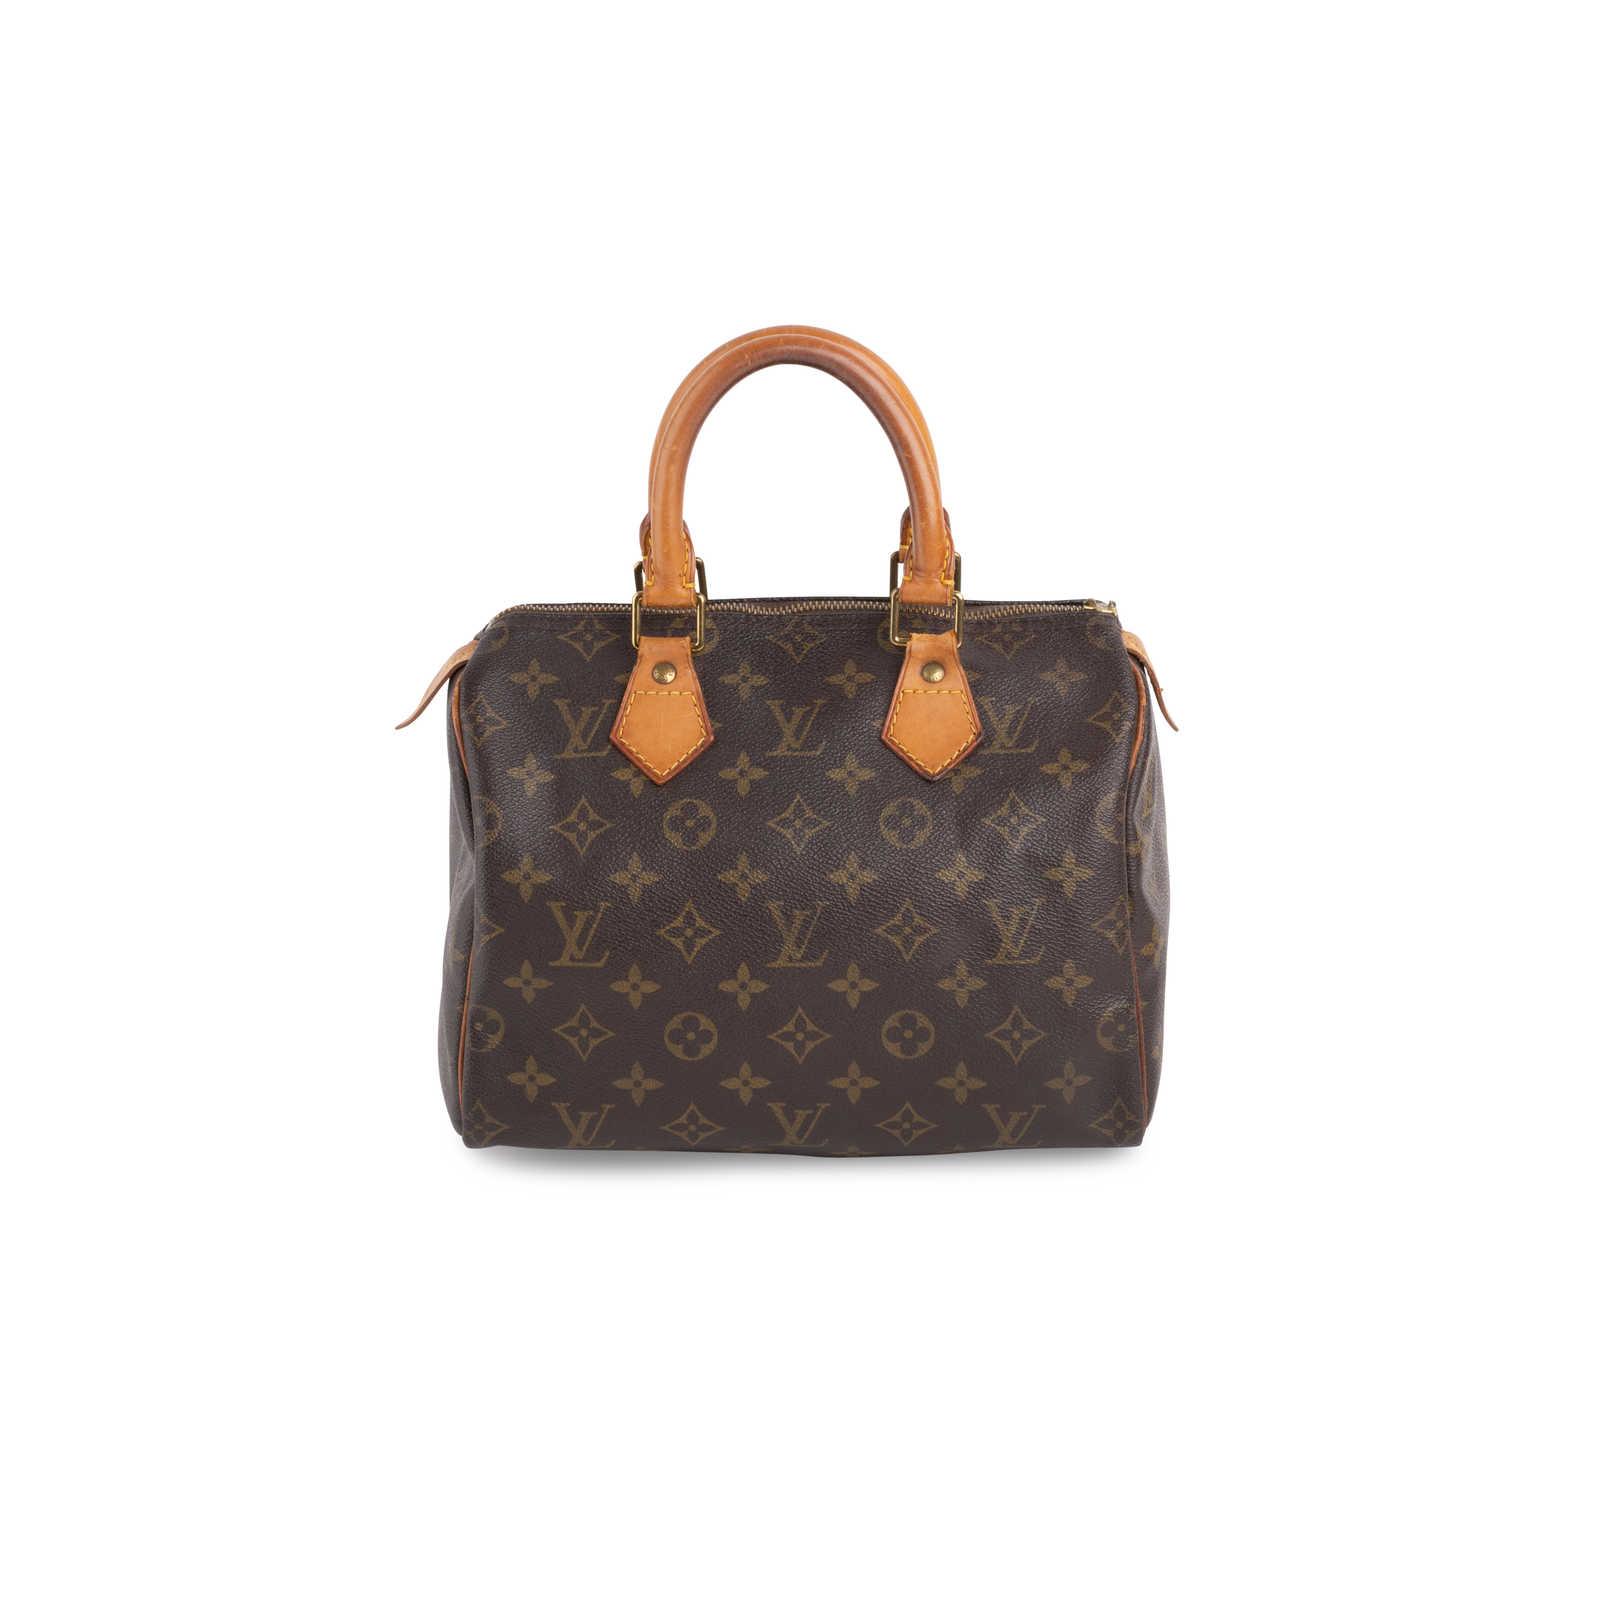 b7fba0831a0 Authentic Second Hand Louis Vuitton Monogram Canvas Speedy 25 (PSS ...